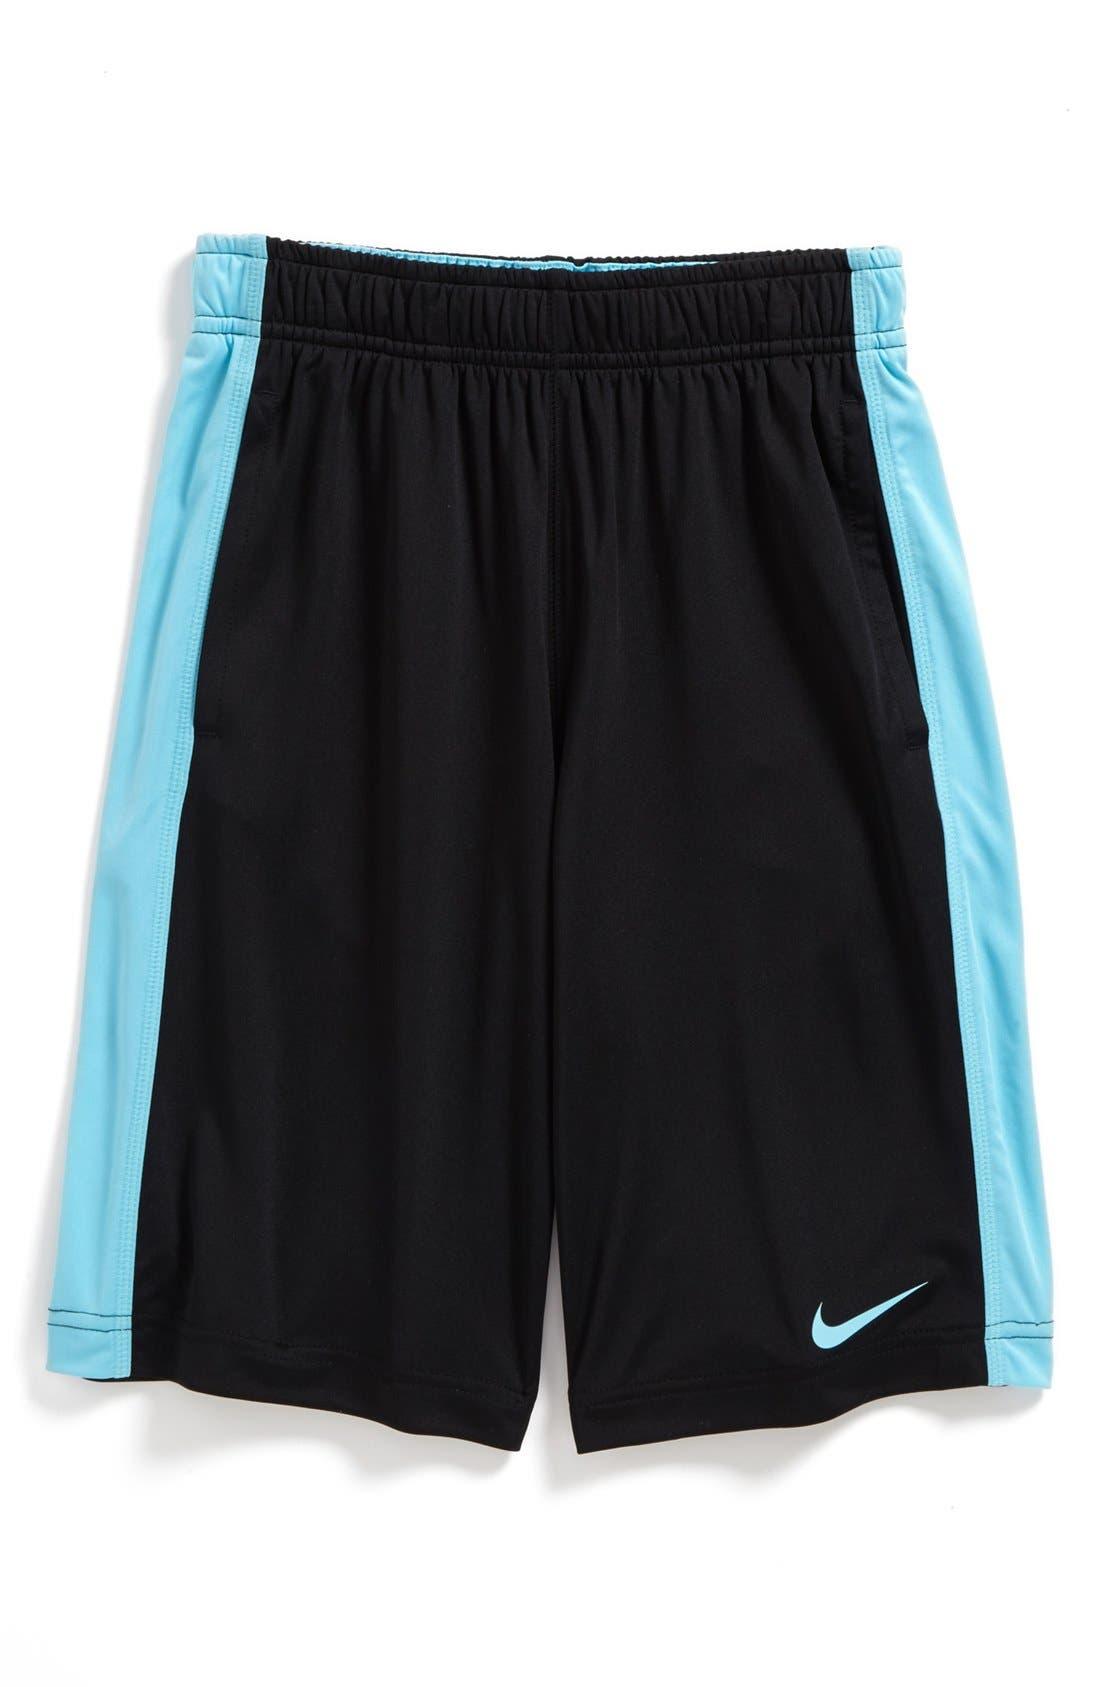 Main Image - Nike 'Fly' Dri-FIT Shorts (Big Boys)